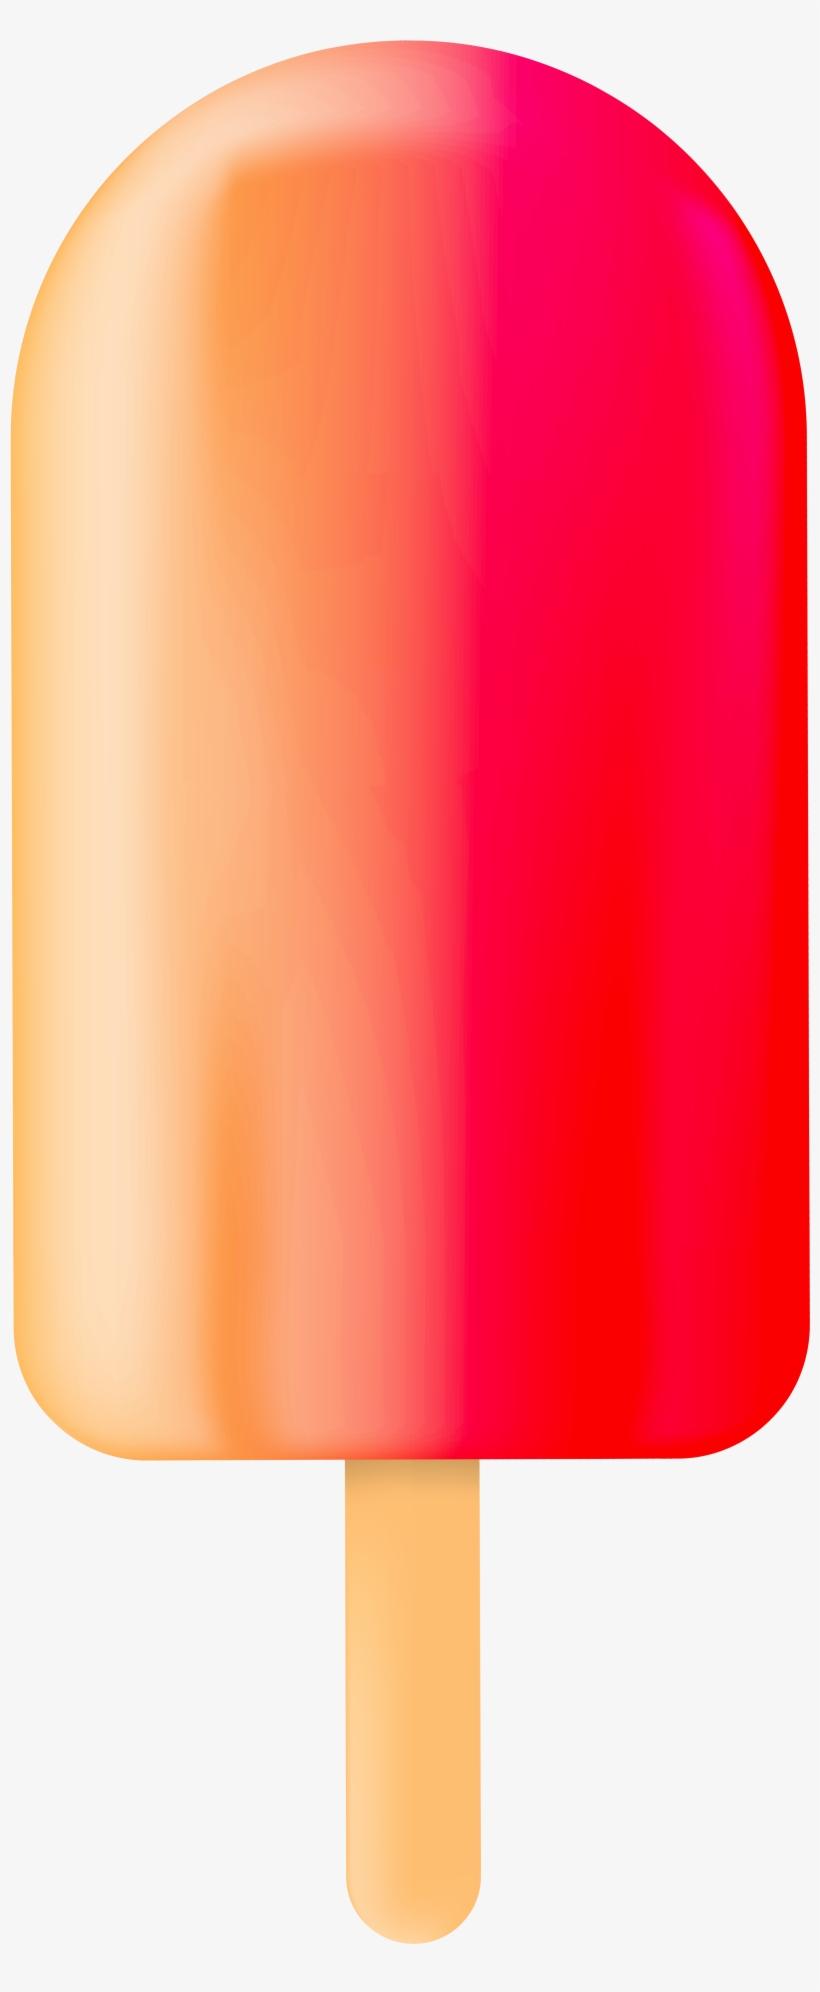 Ice Cream Bar Png Clip Art - Clip Art Ice Cream Bar, transparent png #2412993